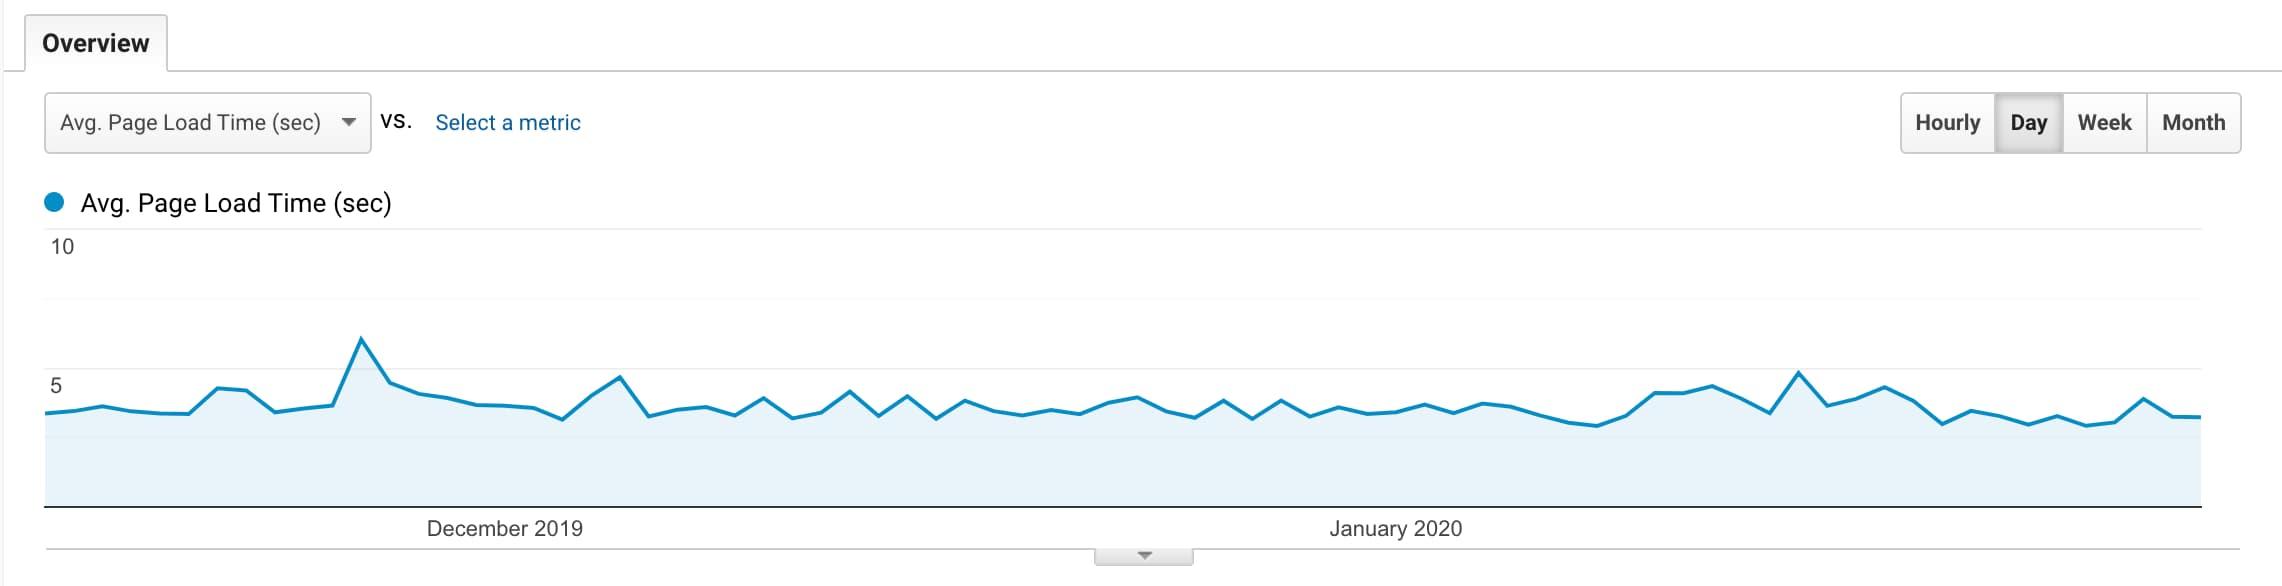 Average page load time Google Analytics